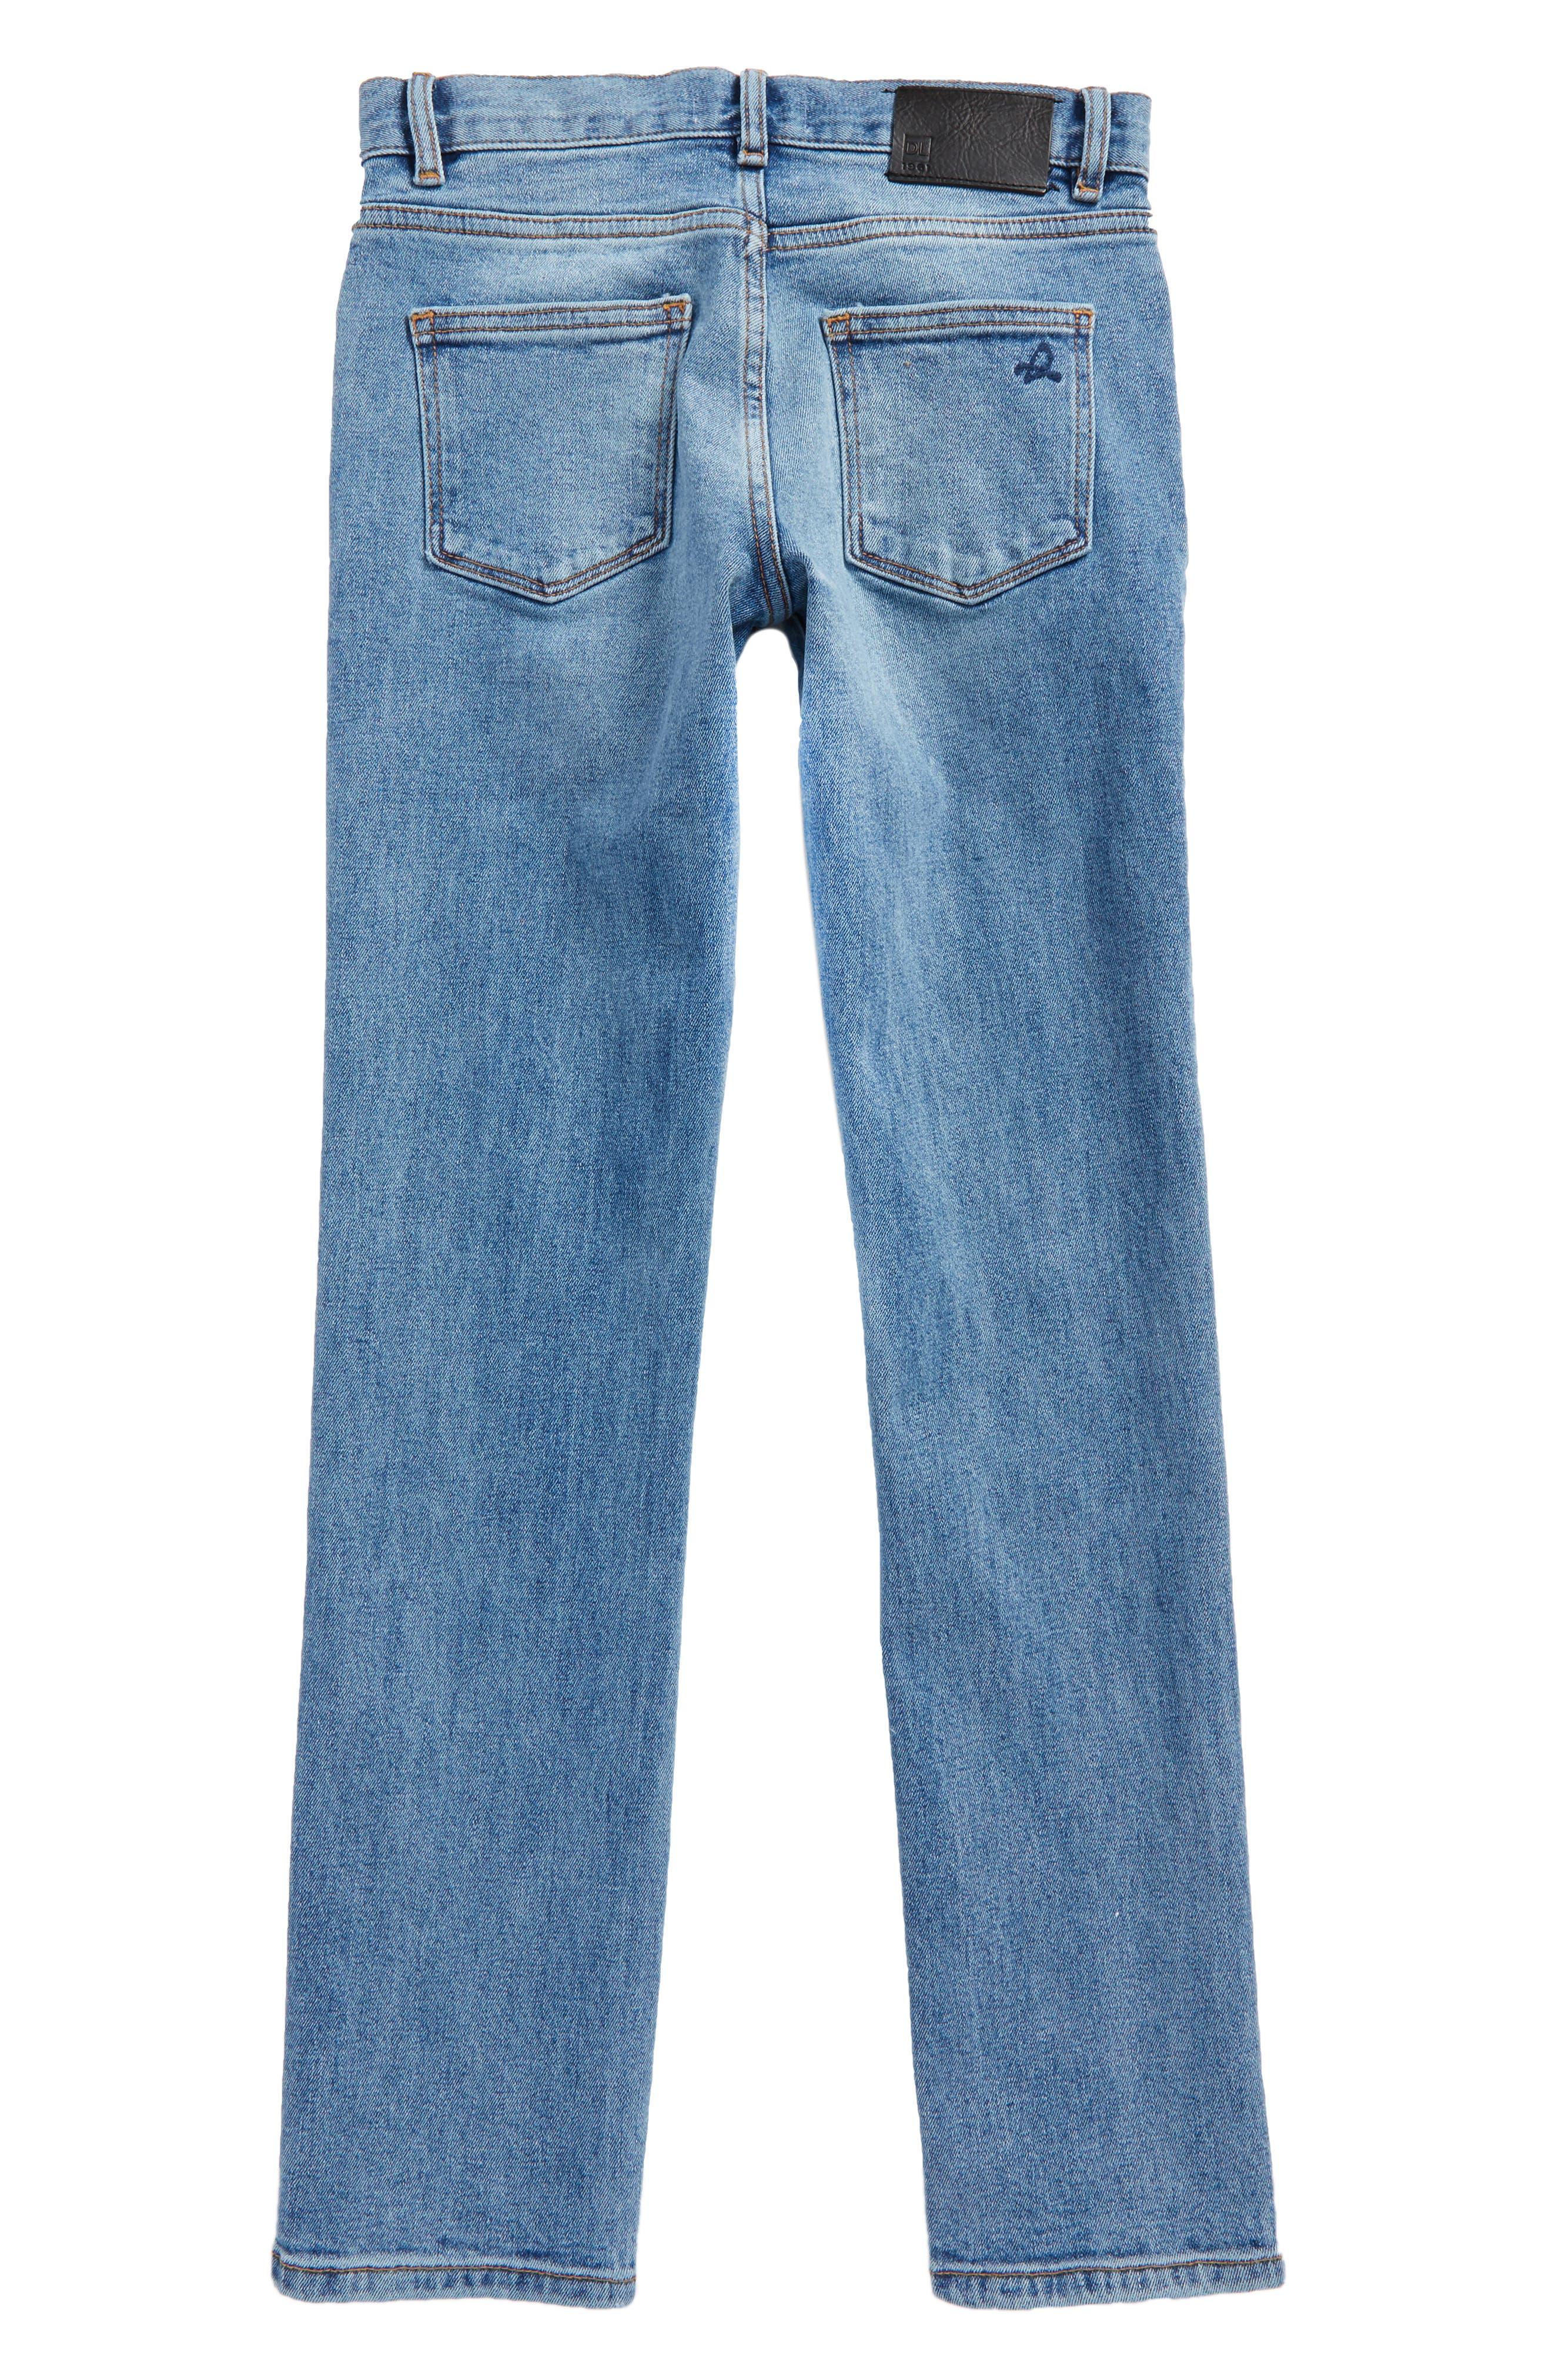 Brady Slim Fit Jeans,                             Alternate thumbnail 2, color,                             BREATHE